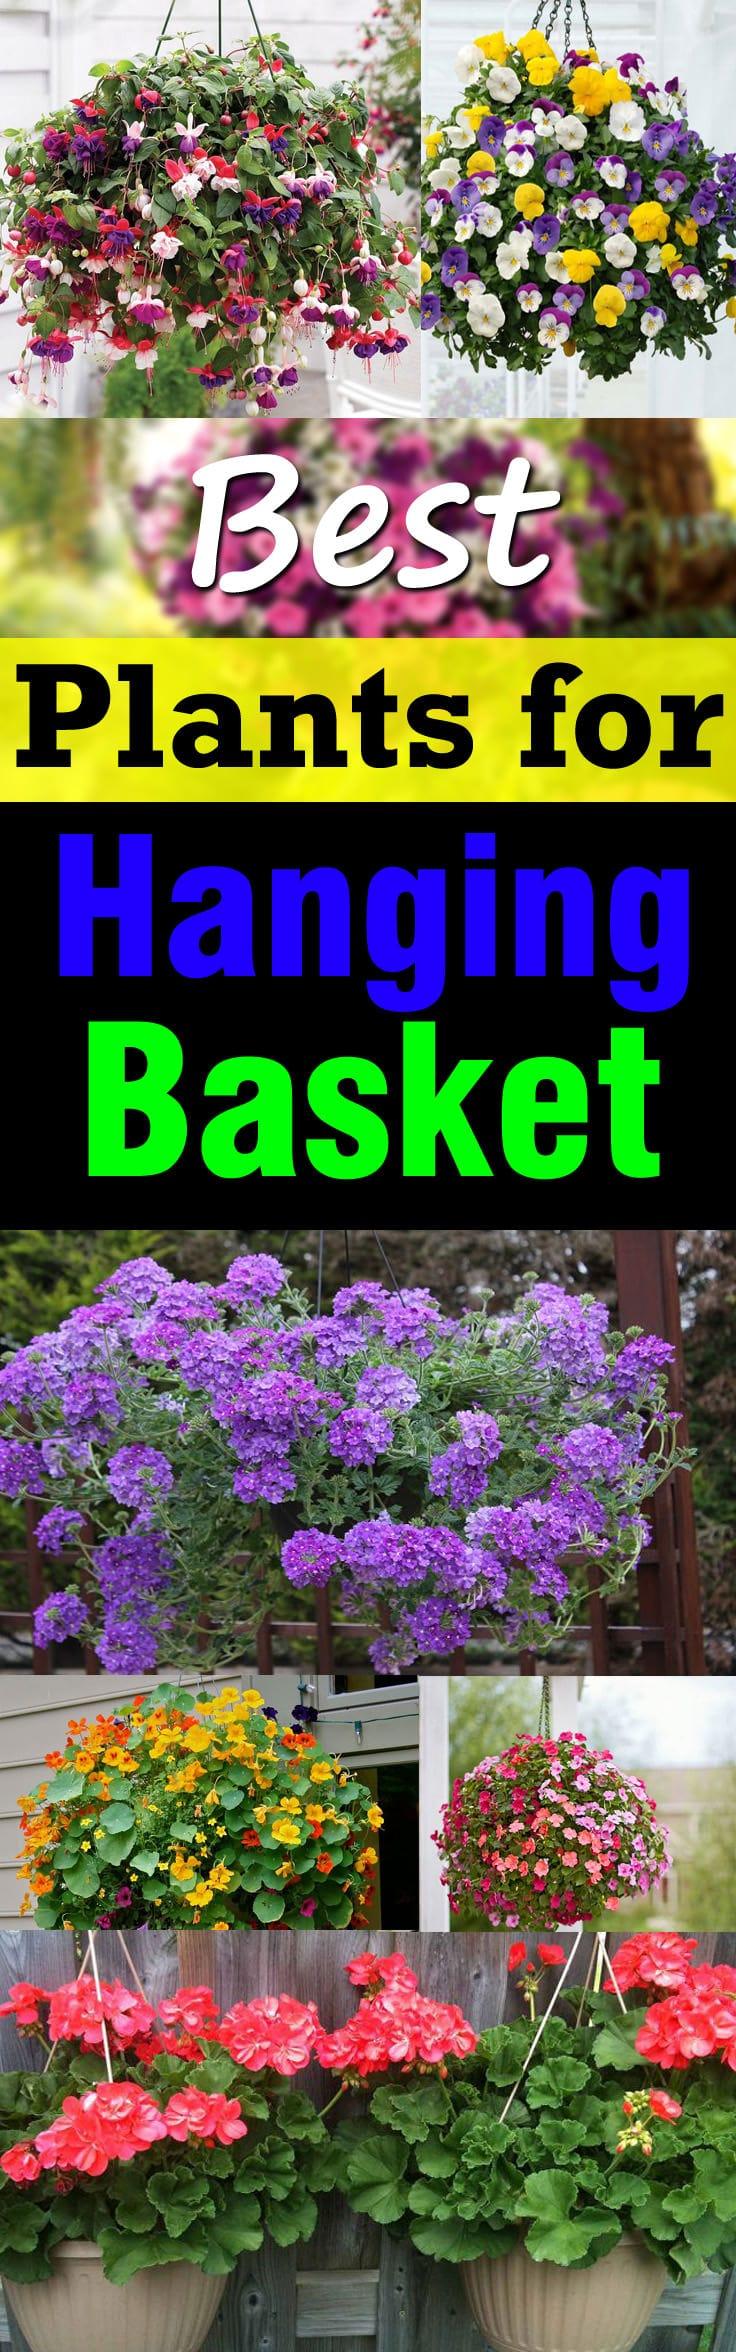 Best Plants For Hanging Baskets | Balcony Garden Web